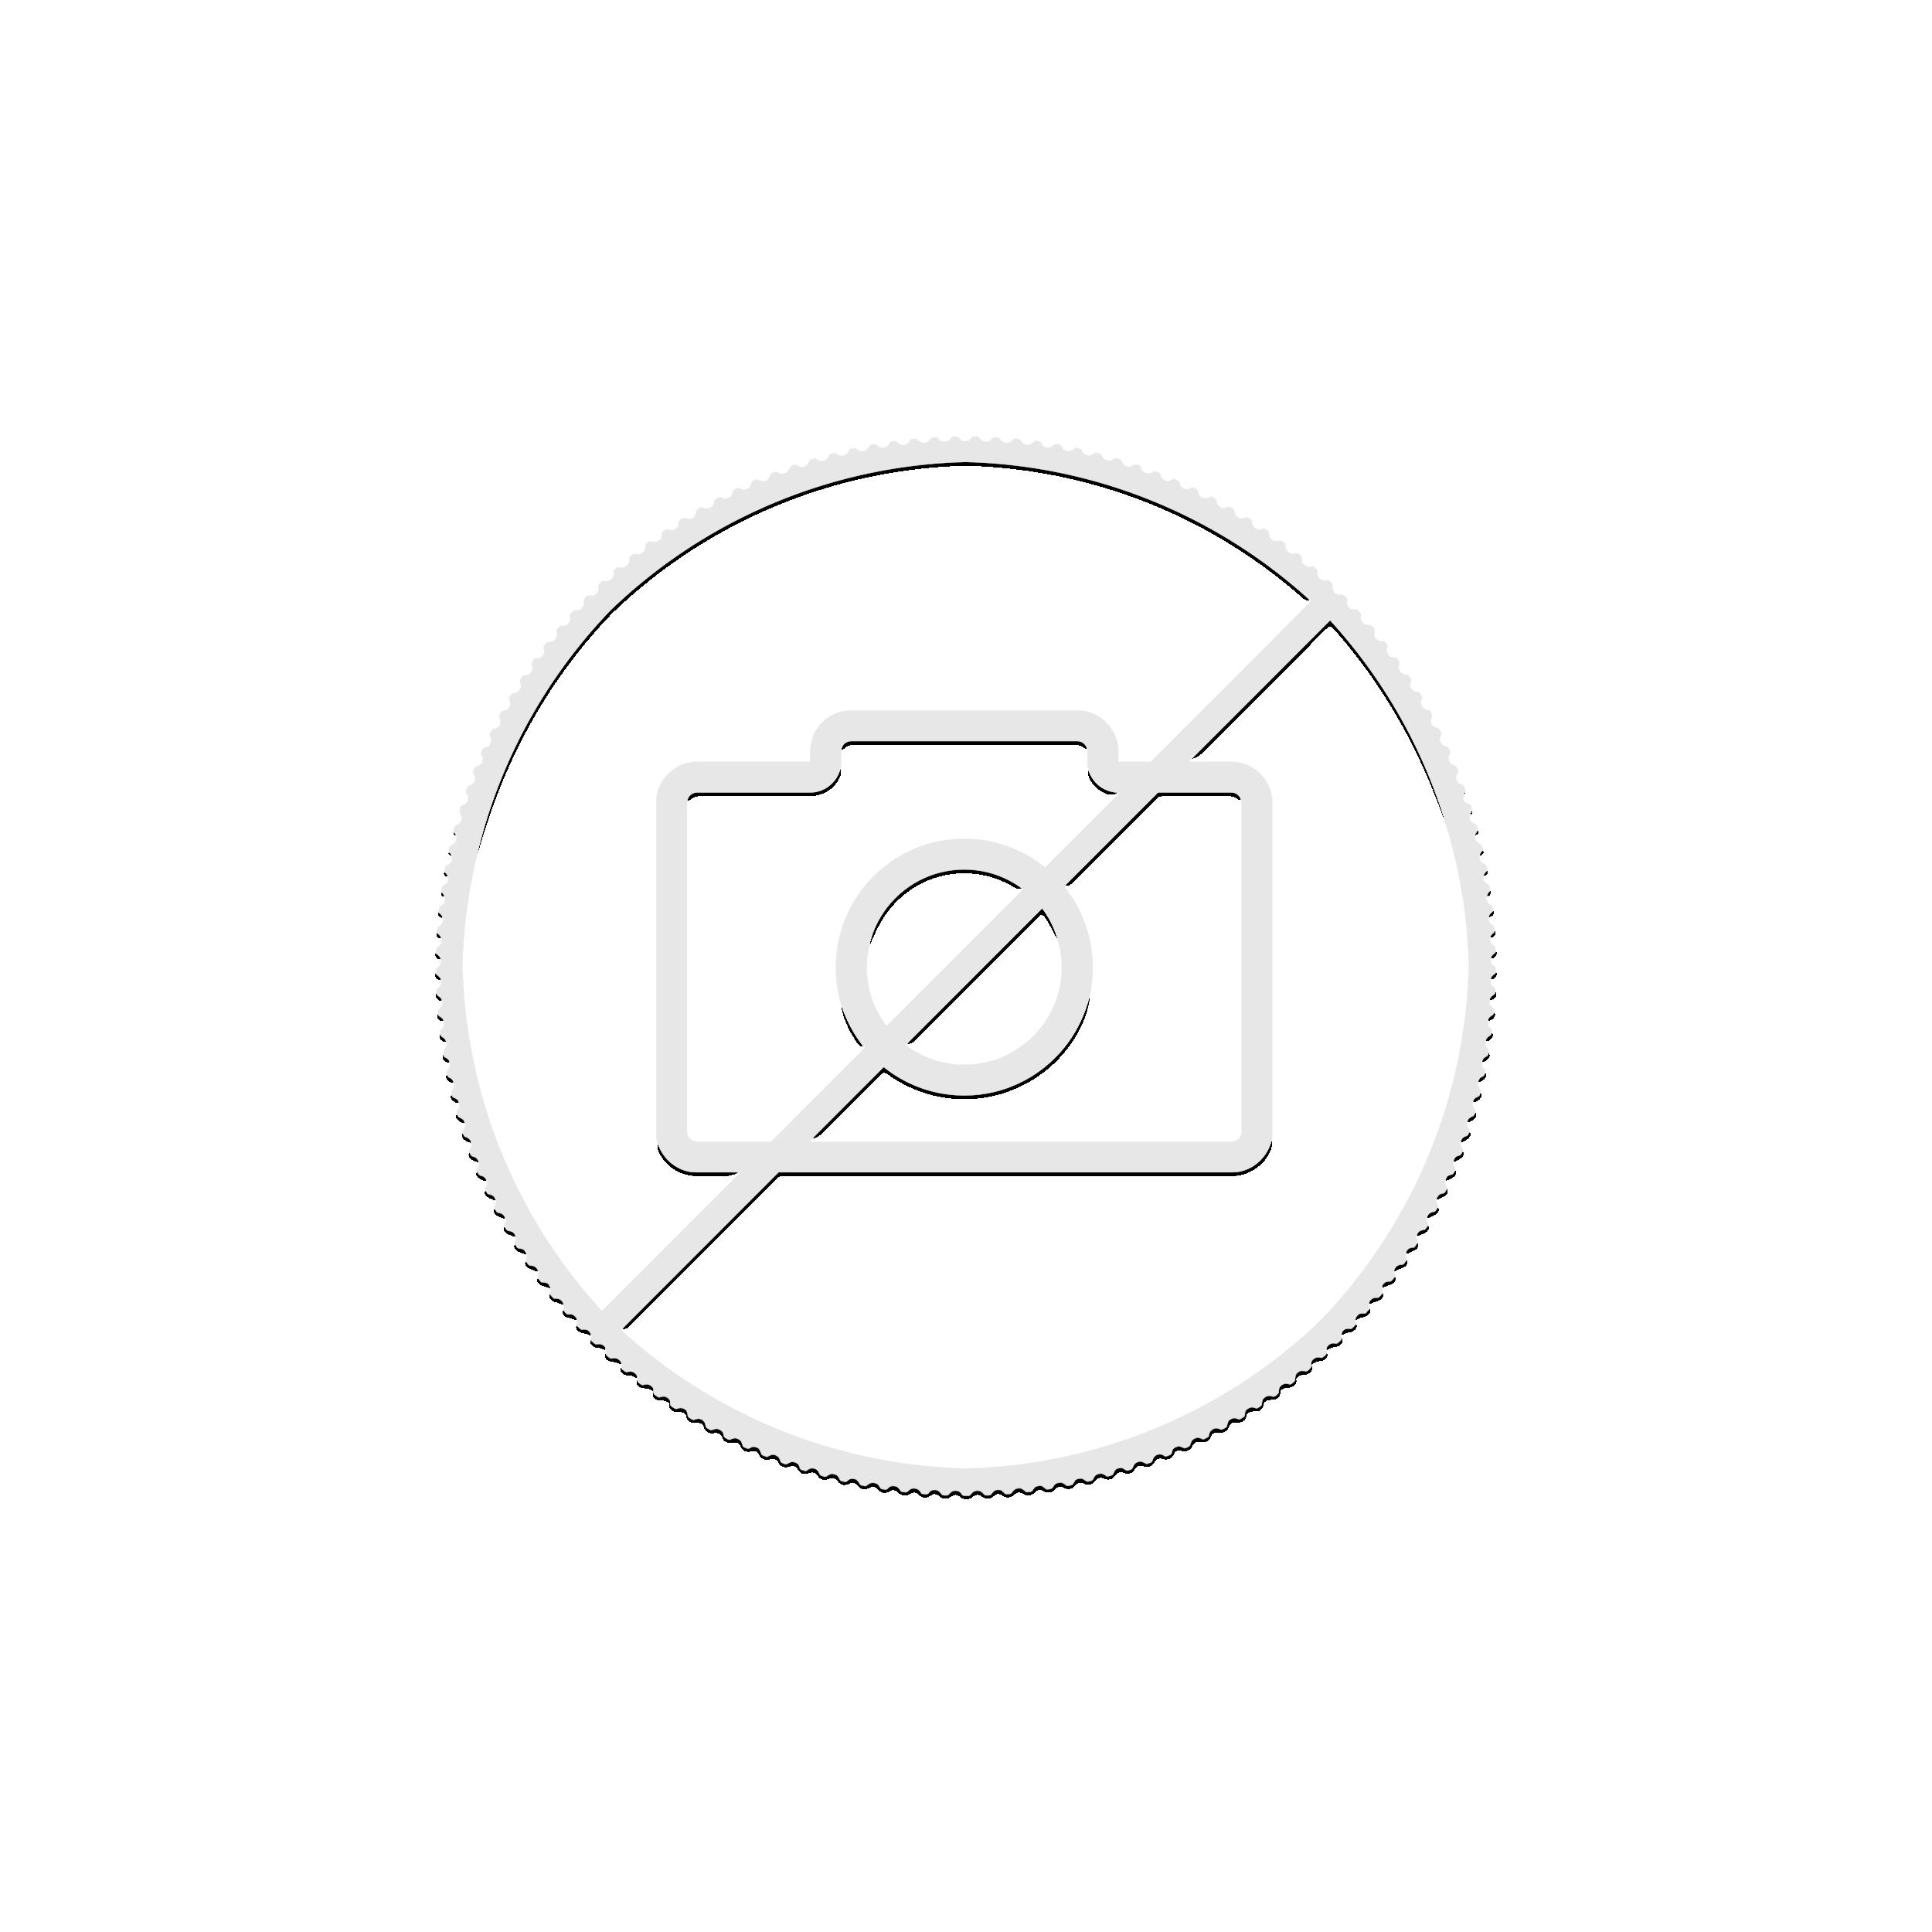 1 troy ounce silver coin Maple Leaf